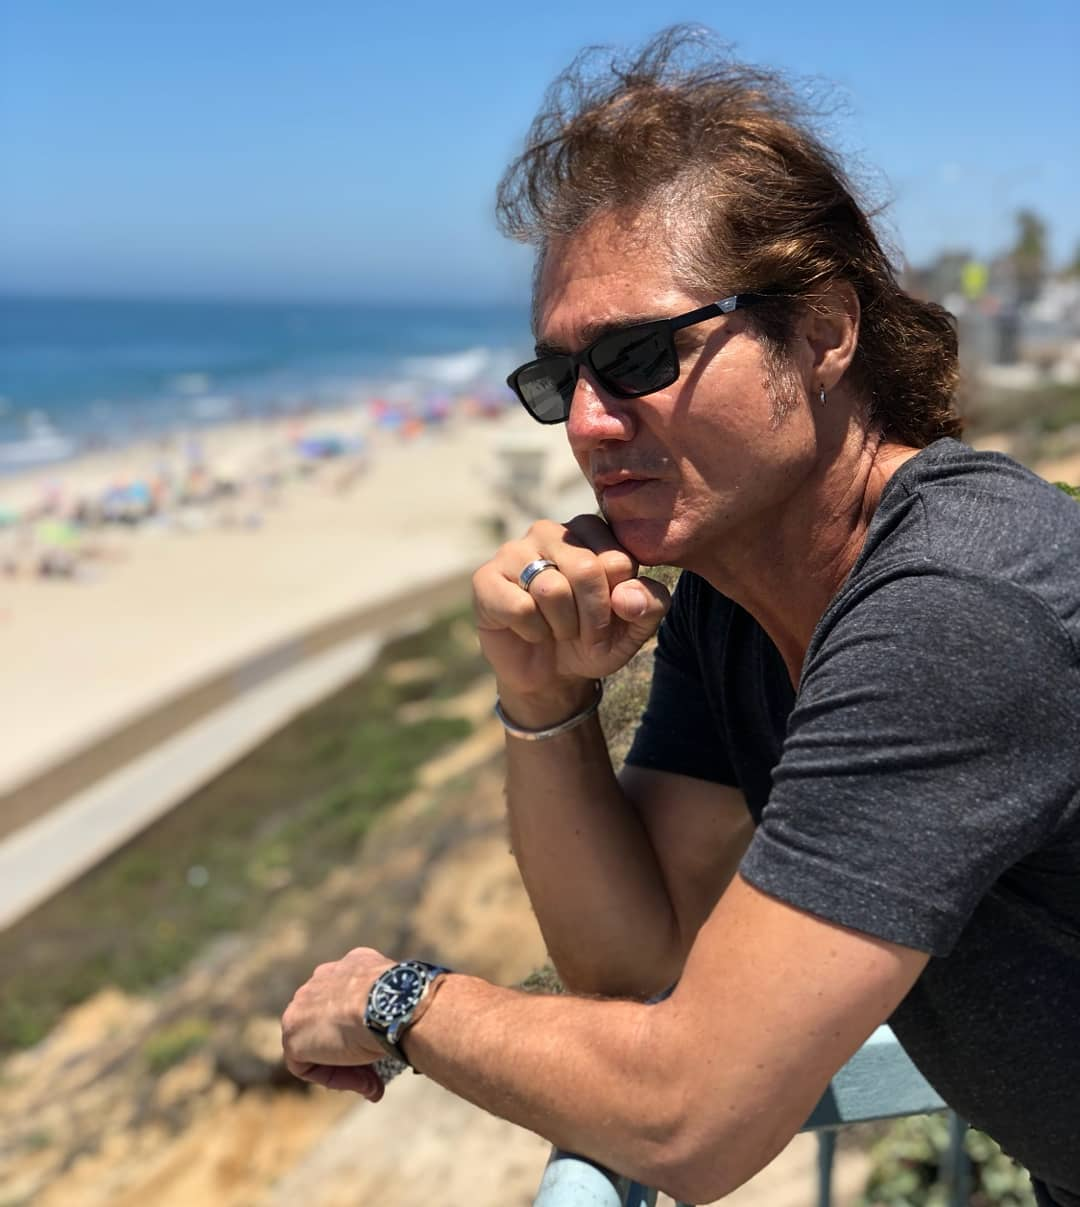 Rob E. Angelino at the beach